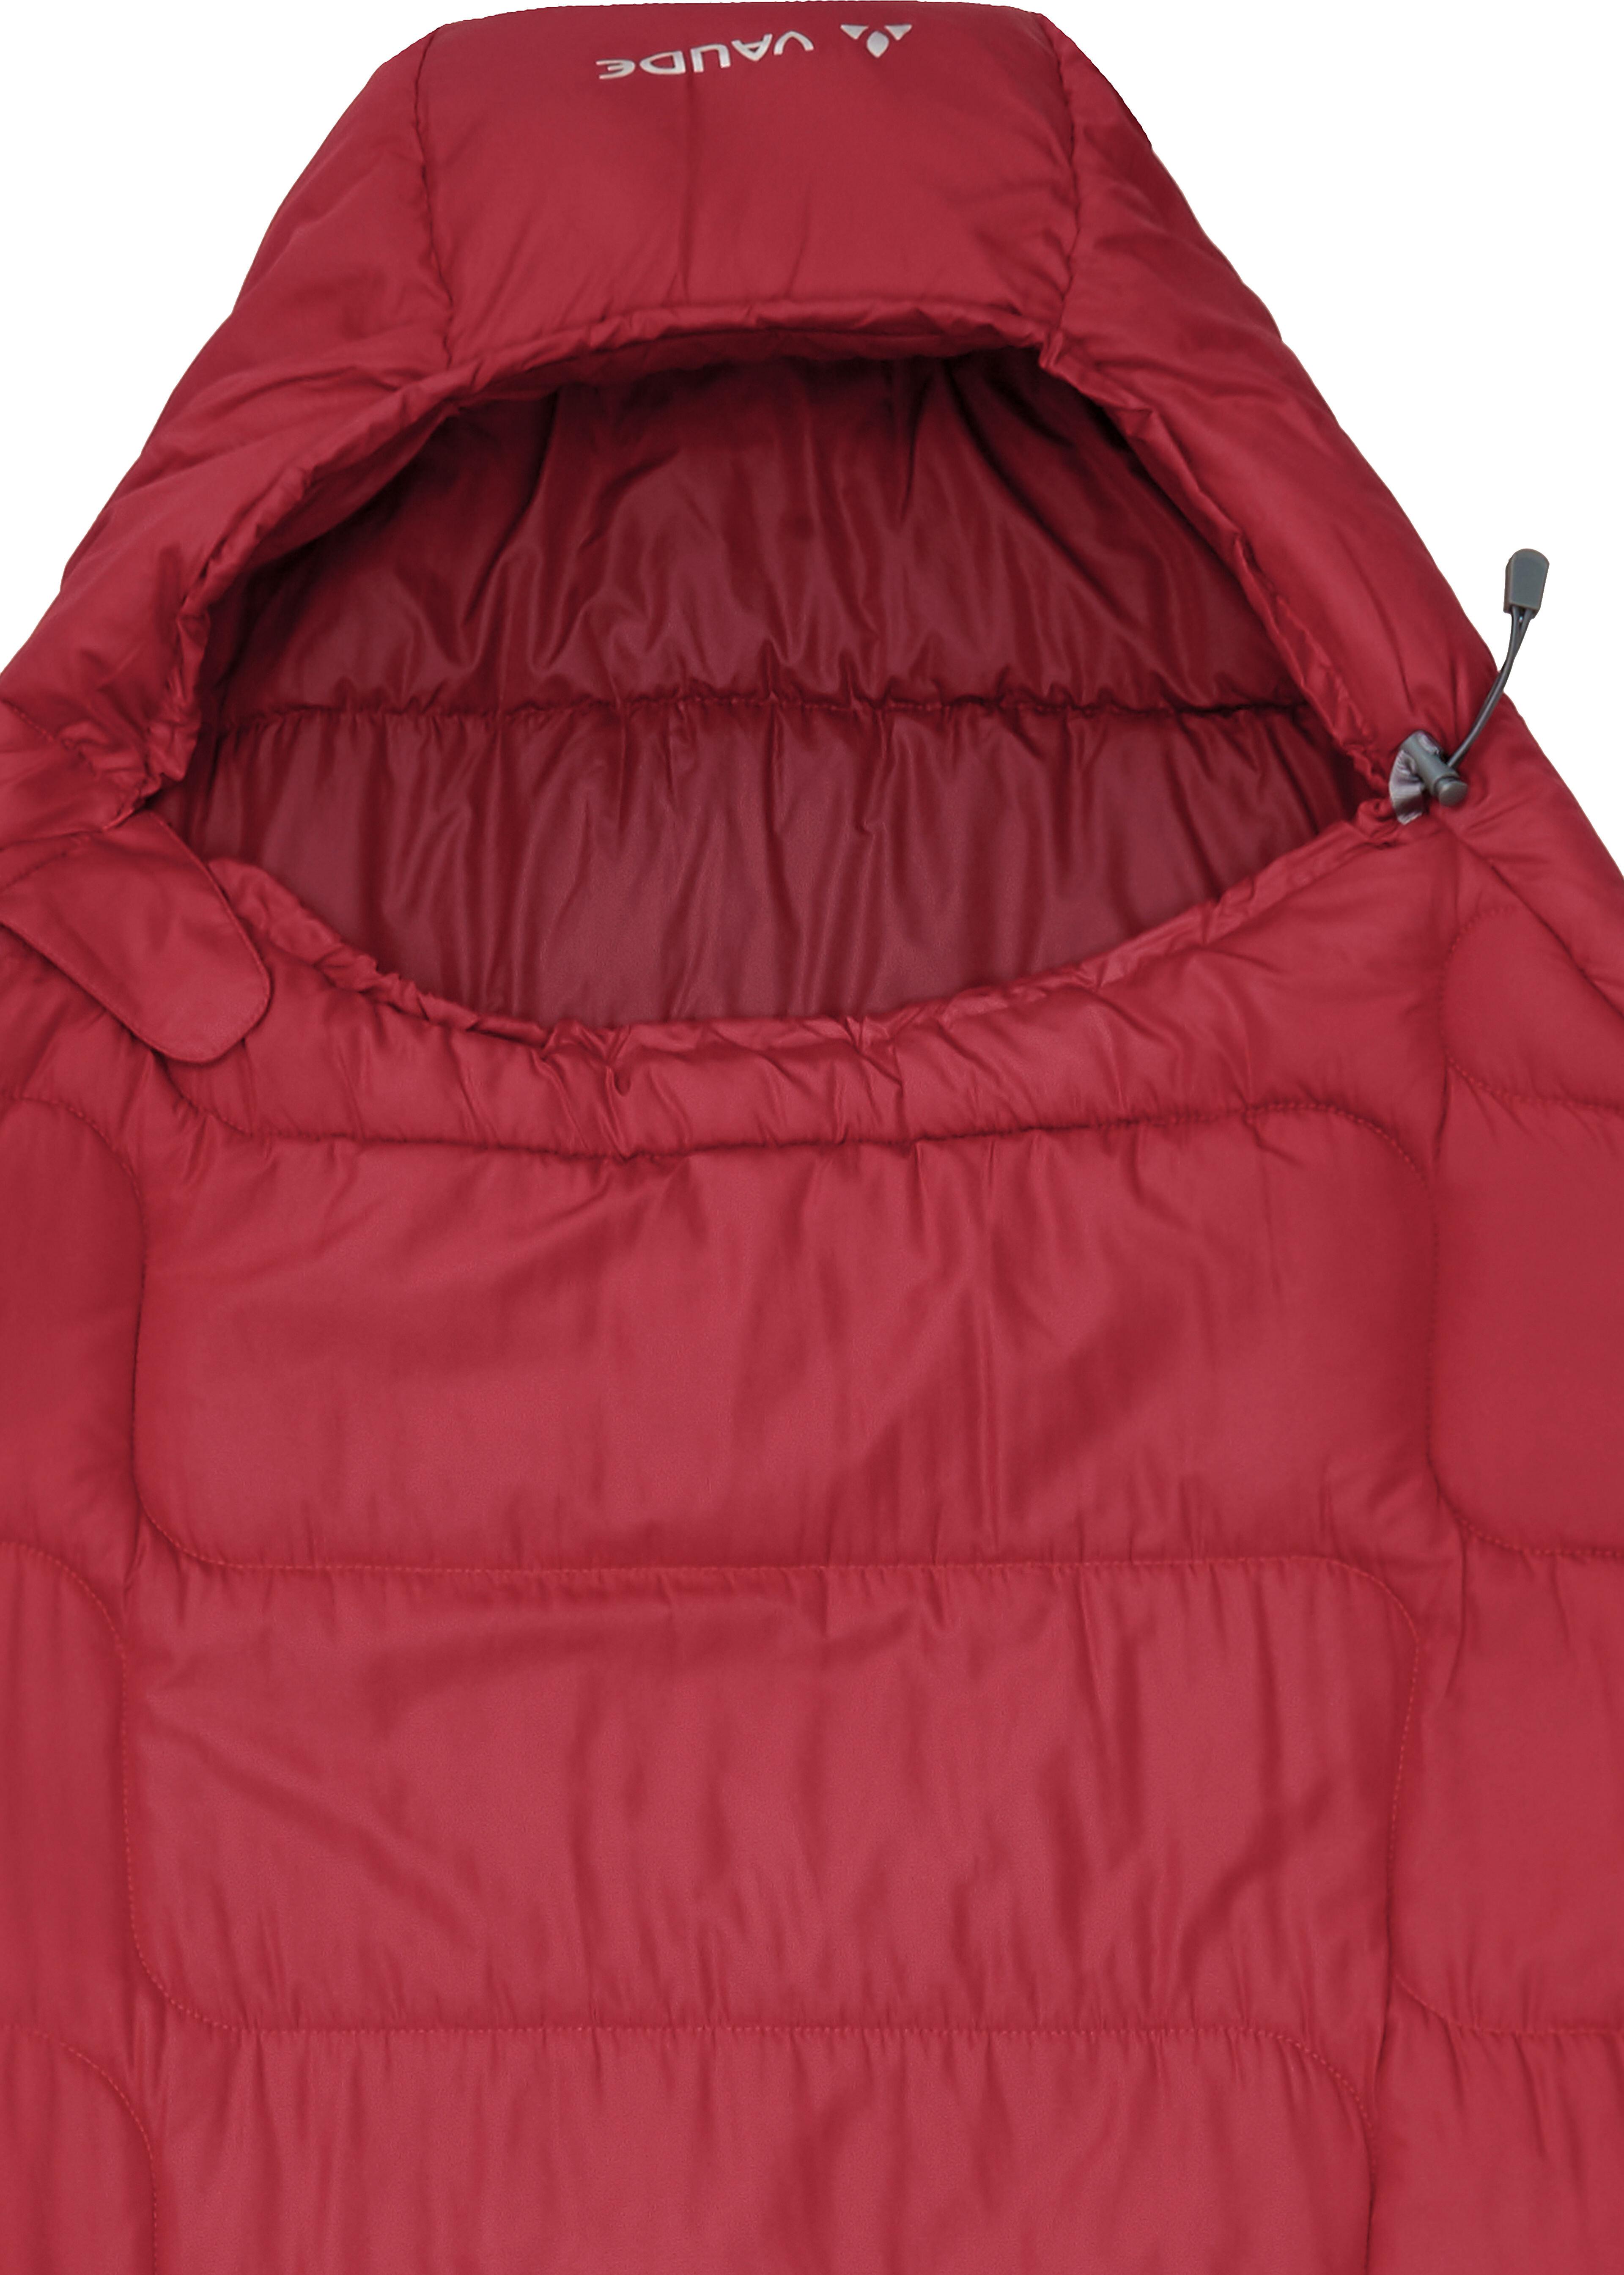 Vaude Sioux 400 Sleeping Bag Review